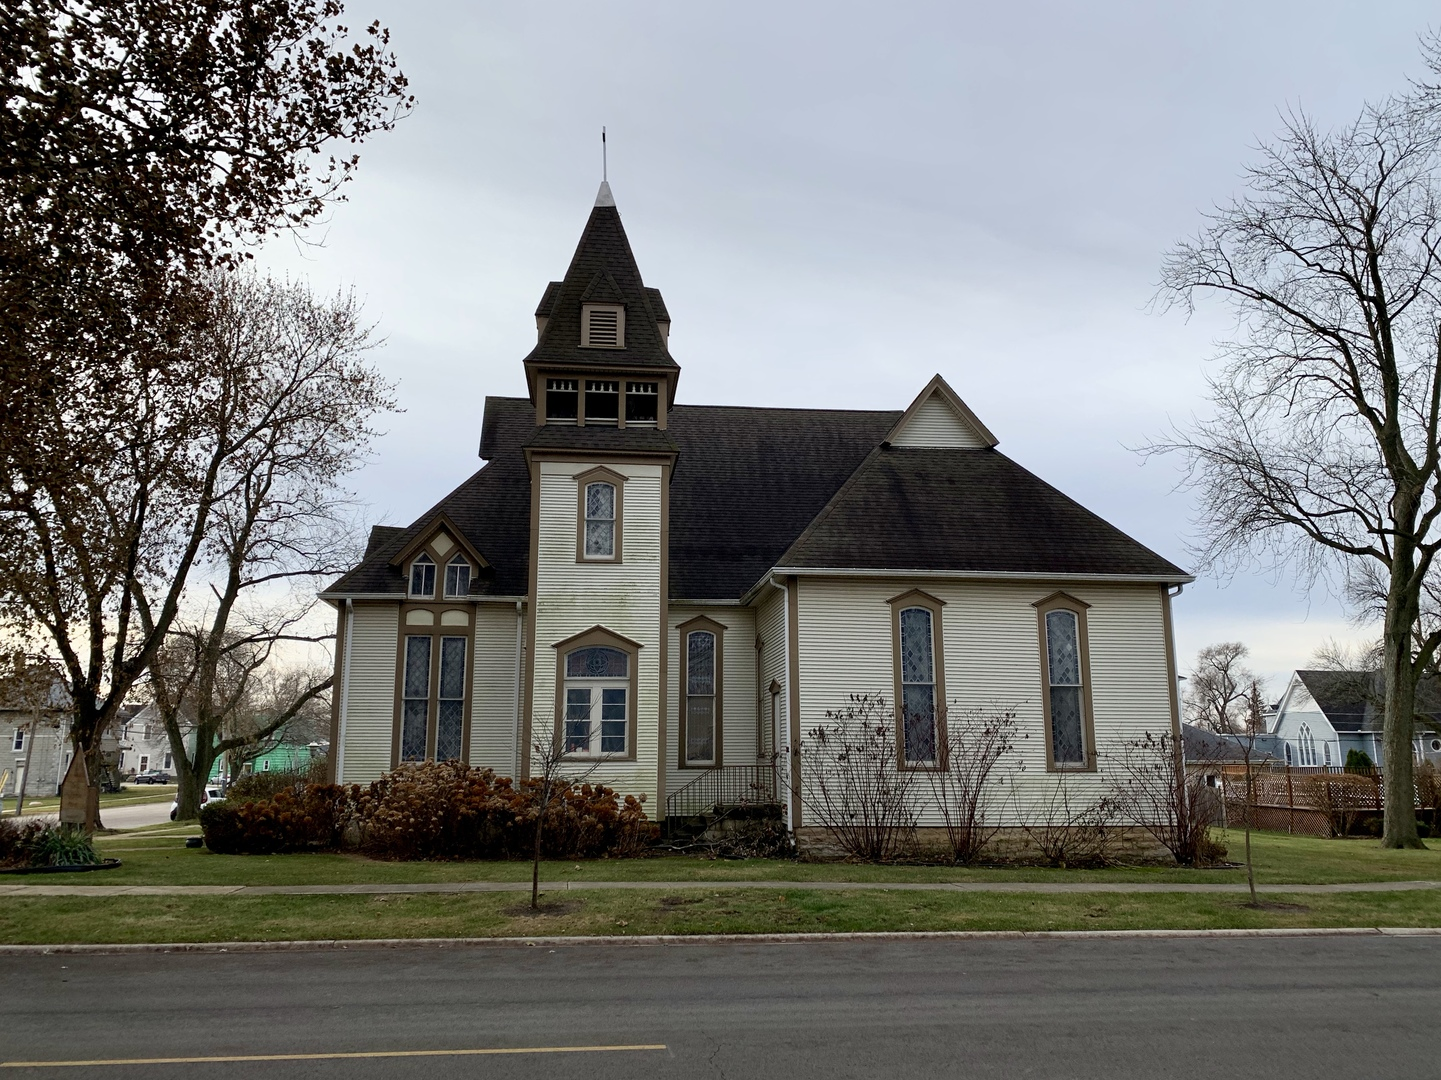 200 West Crawford, Peotone, Illinois, 60468